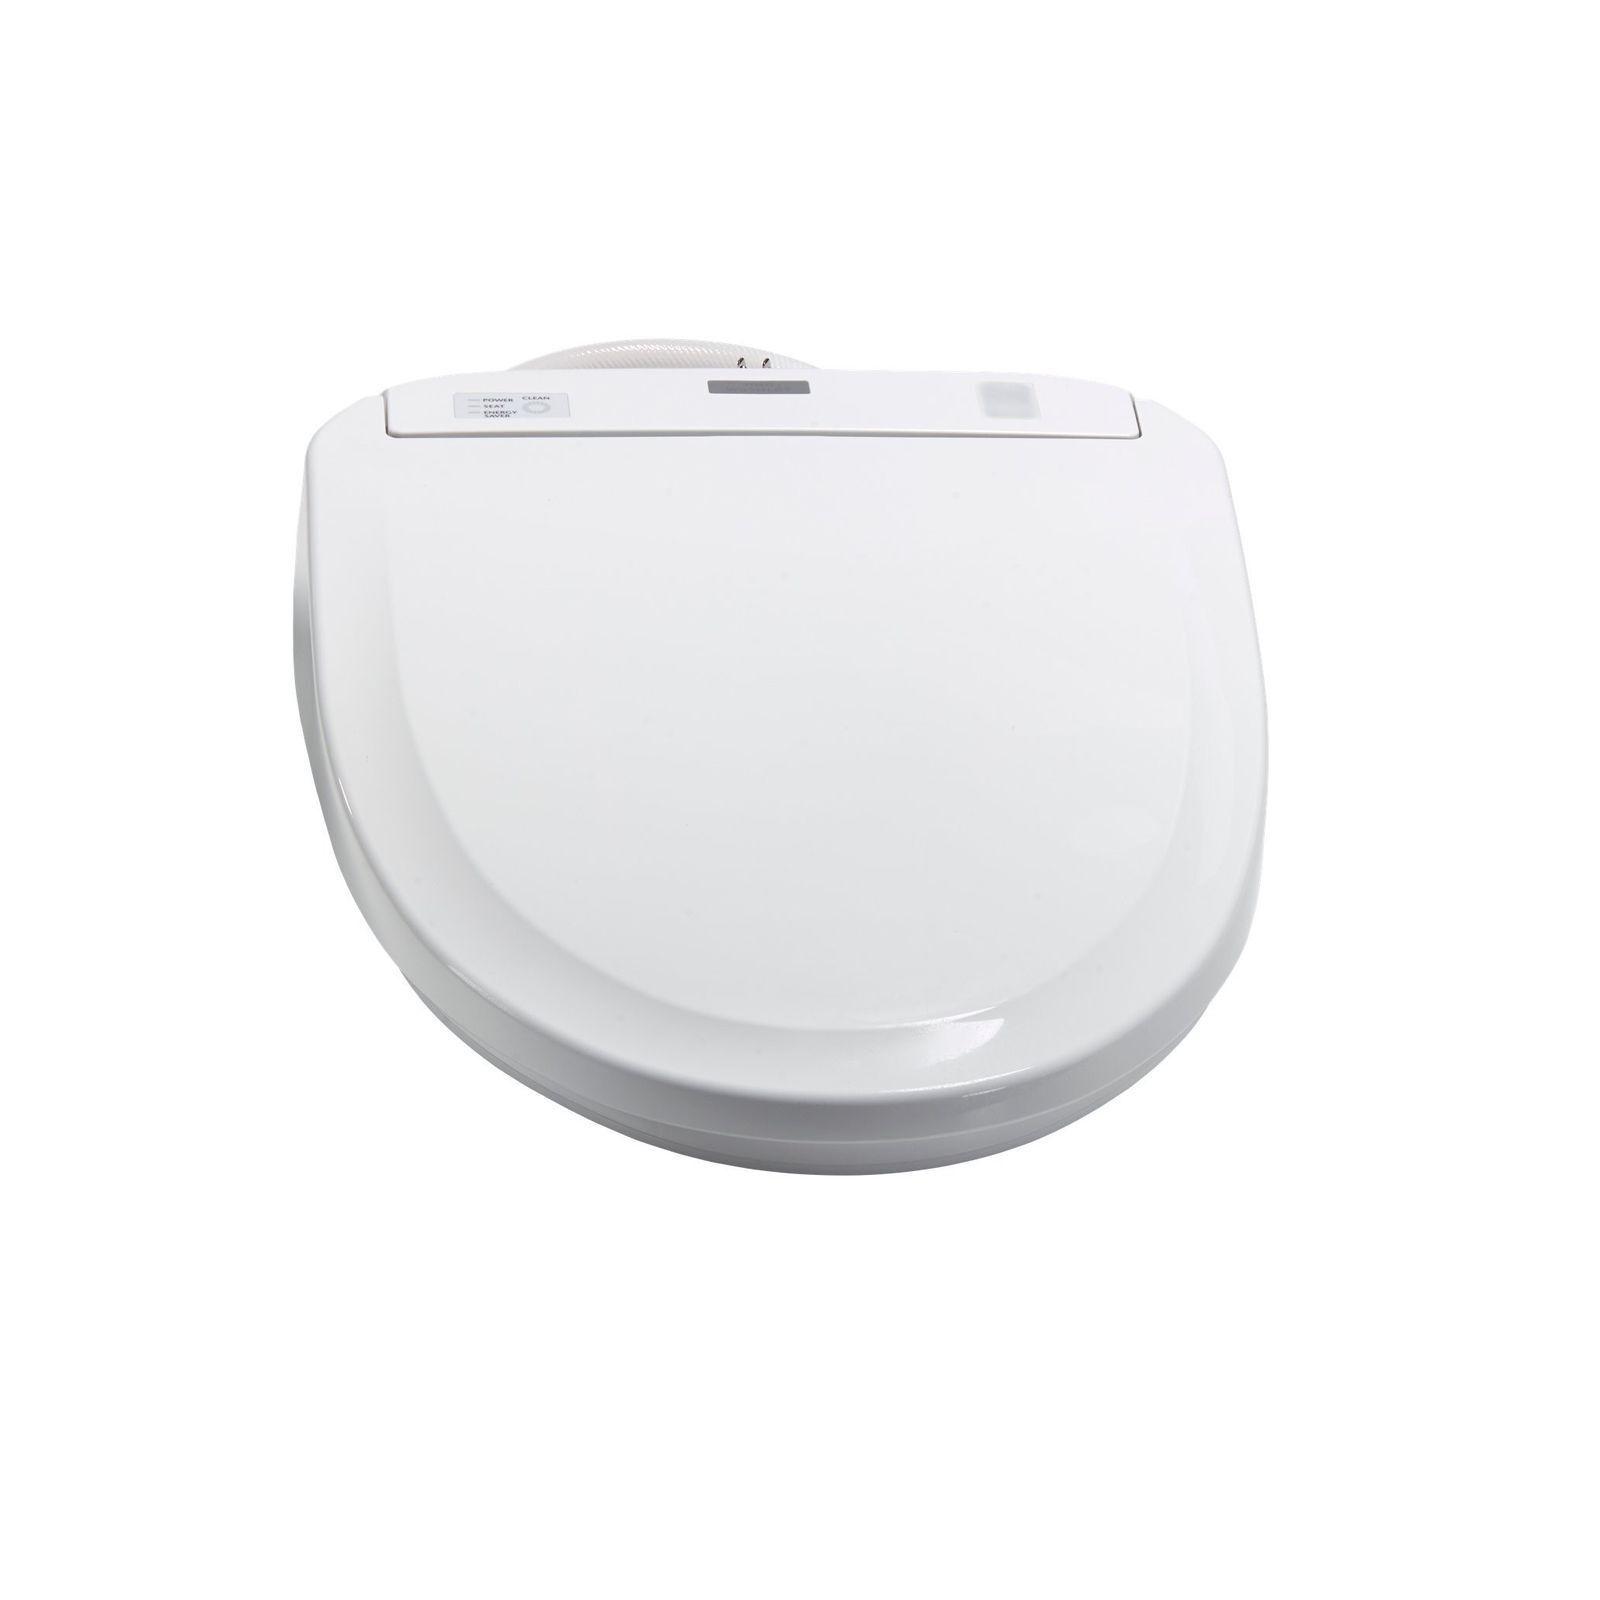 TOTO Sw574-01 White Washlet S300e Elongated Toilet Seat With Ewater ...